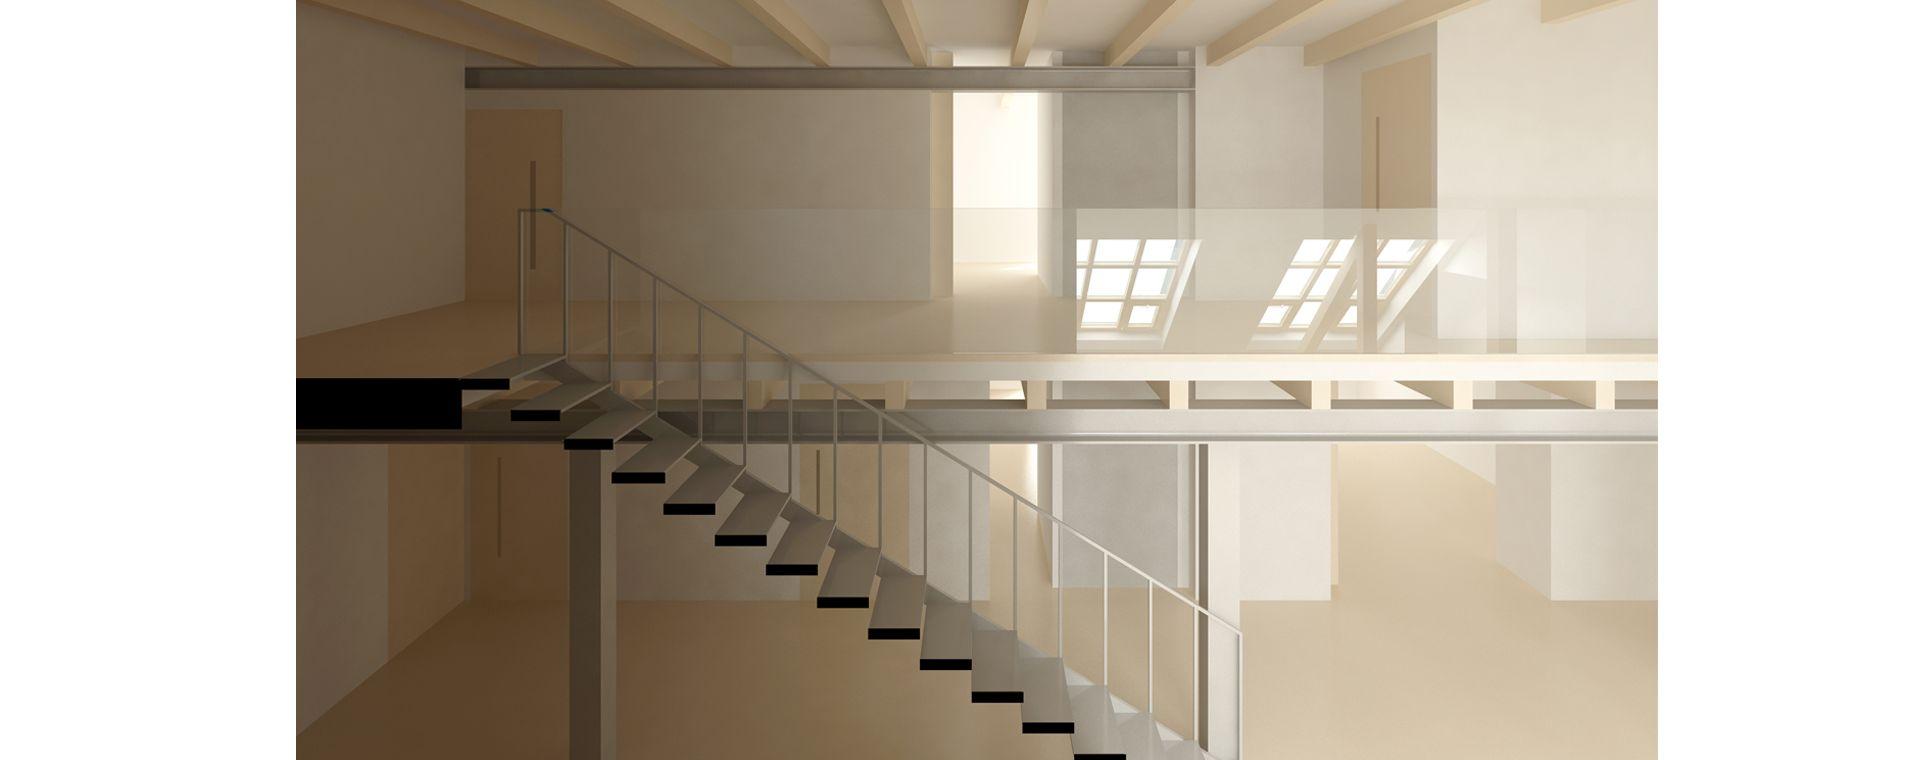 Návrh studie duplexu a realizace na Praze 7 s výtahem, duplex, mezonet, loft, Korunovační, Praha 7, 2017-2020, CZ